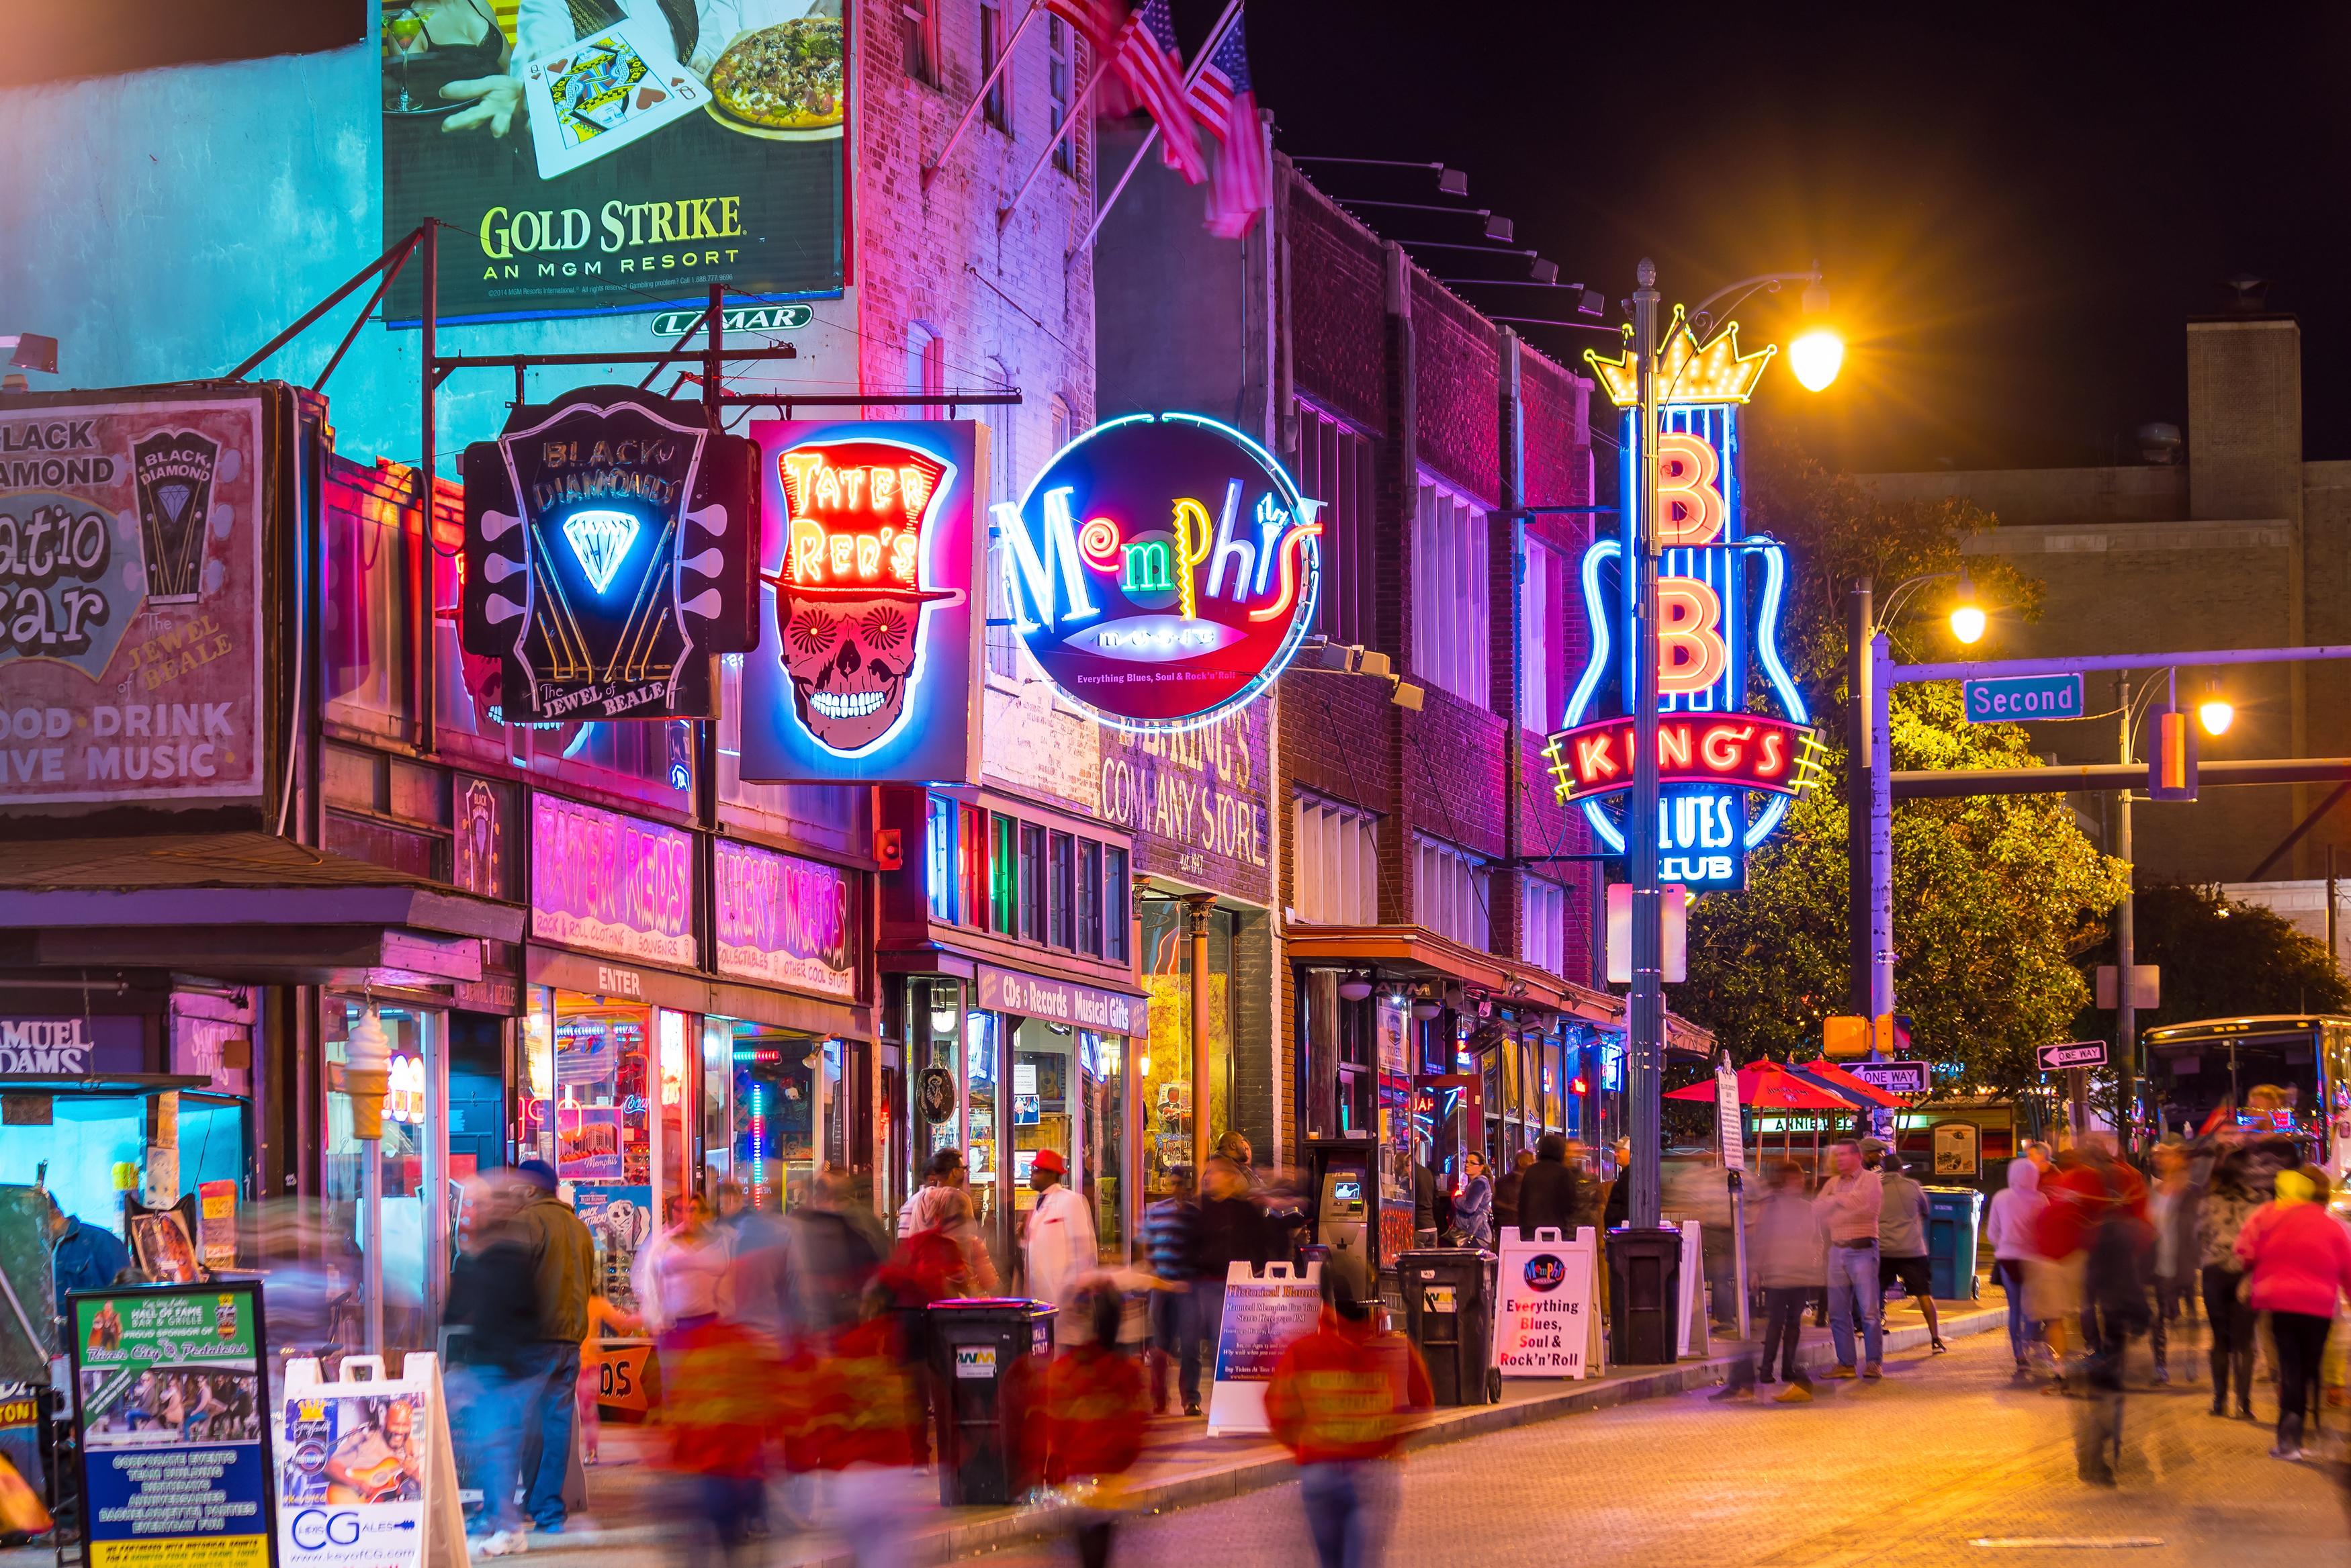 TN - Memphis - Beale Street grande